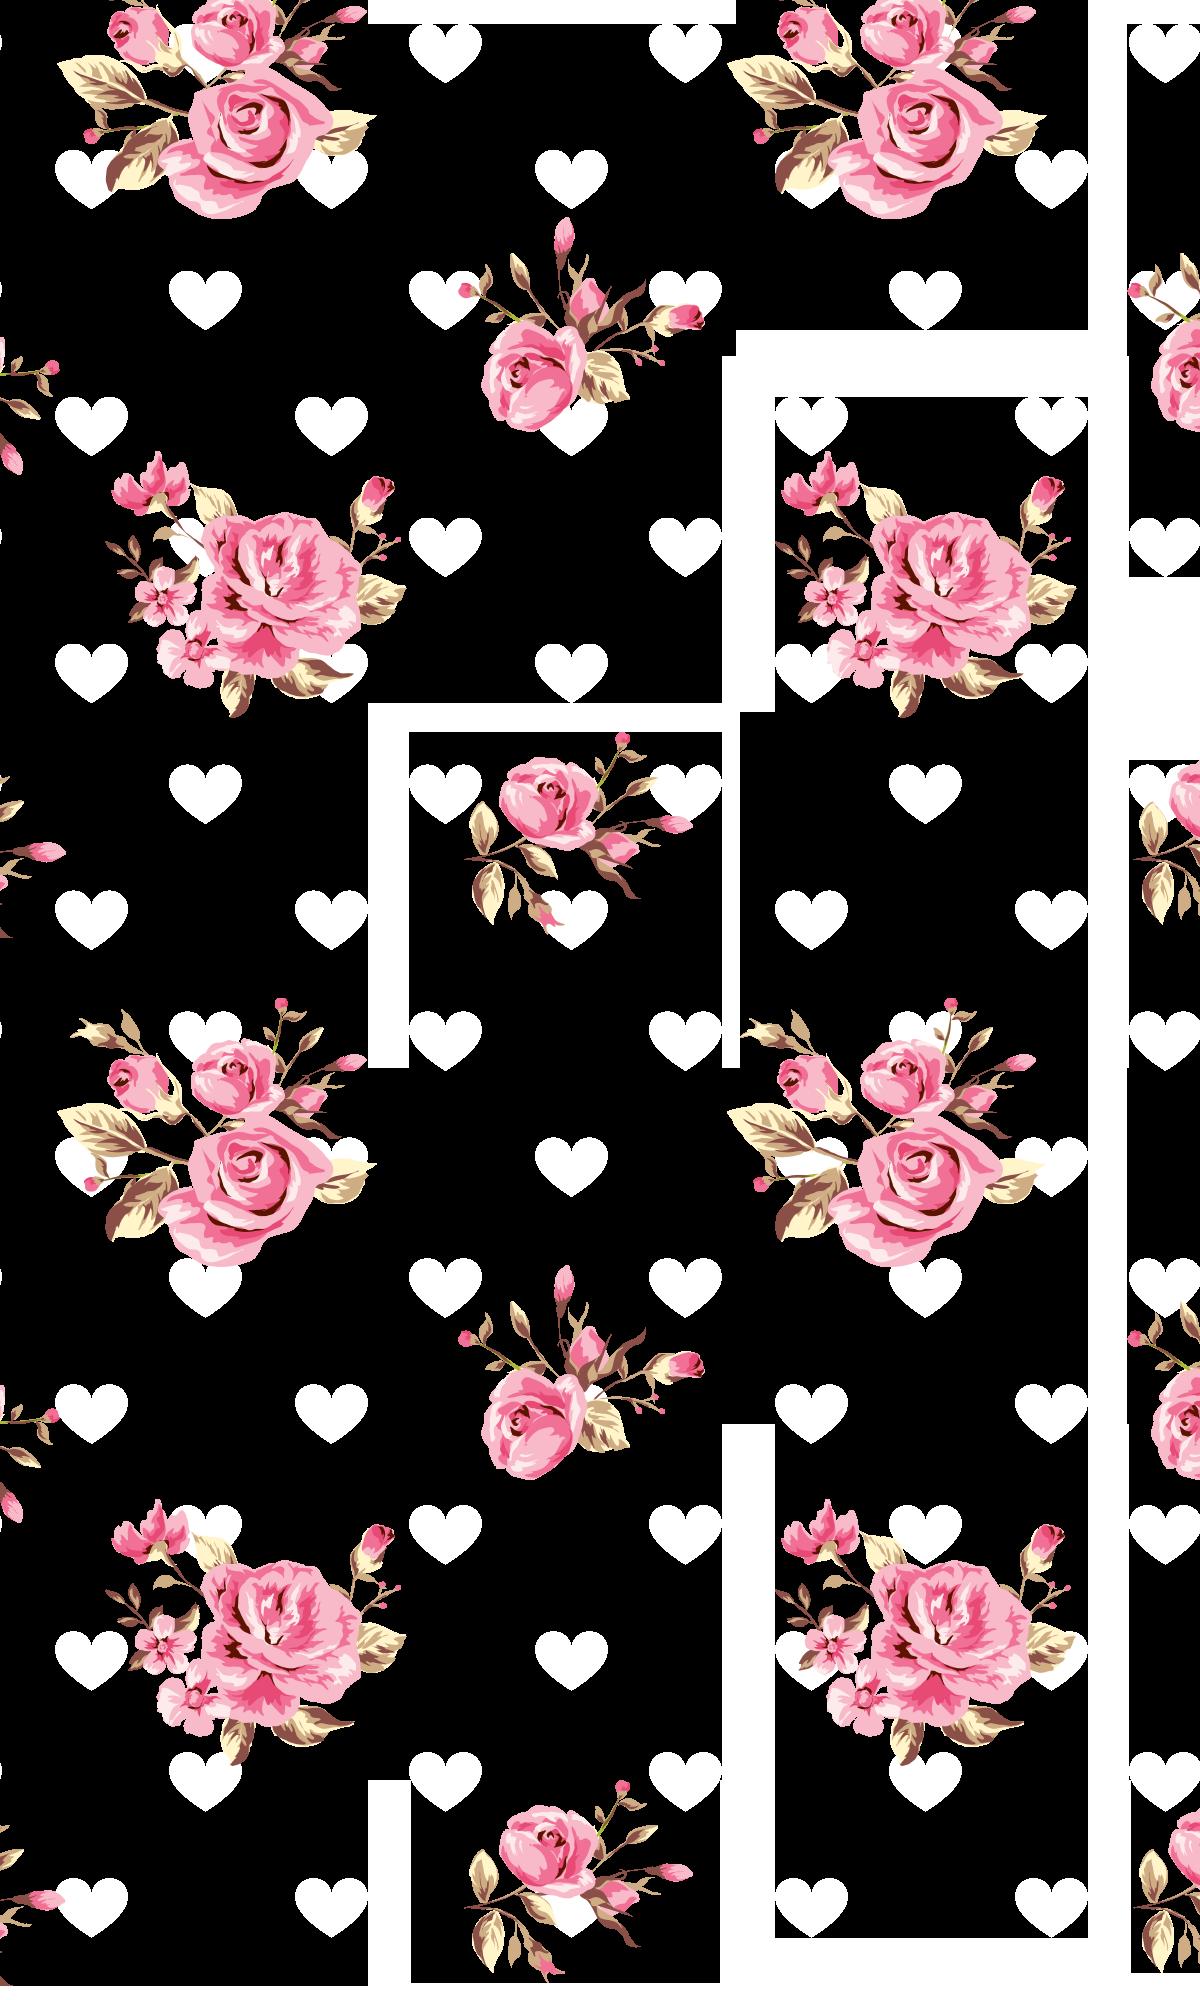 Casetify Floral Iphone Case Wallpaper Ideas Cute And Romantic Floral Wallpaper Iphone Flower Phone Wallpaper Vintage Floral Wallpapers